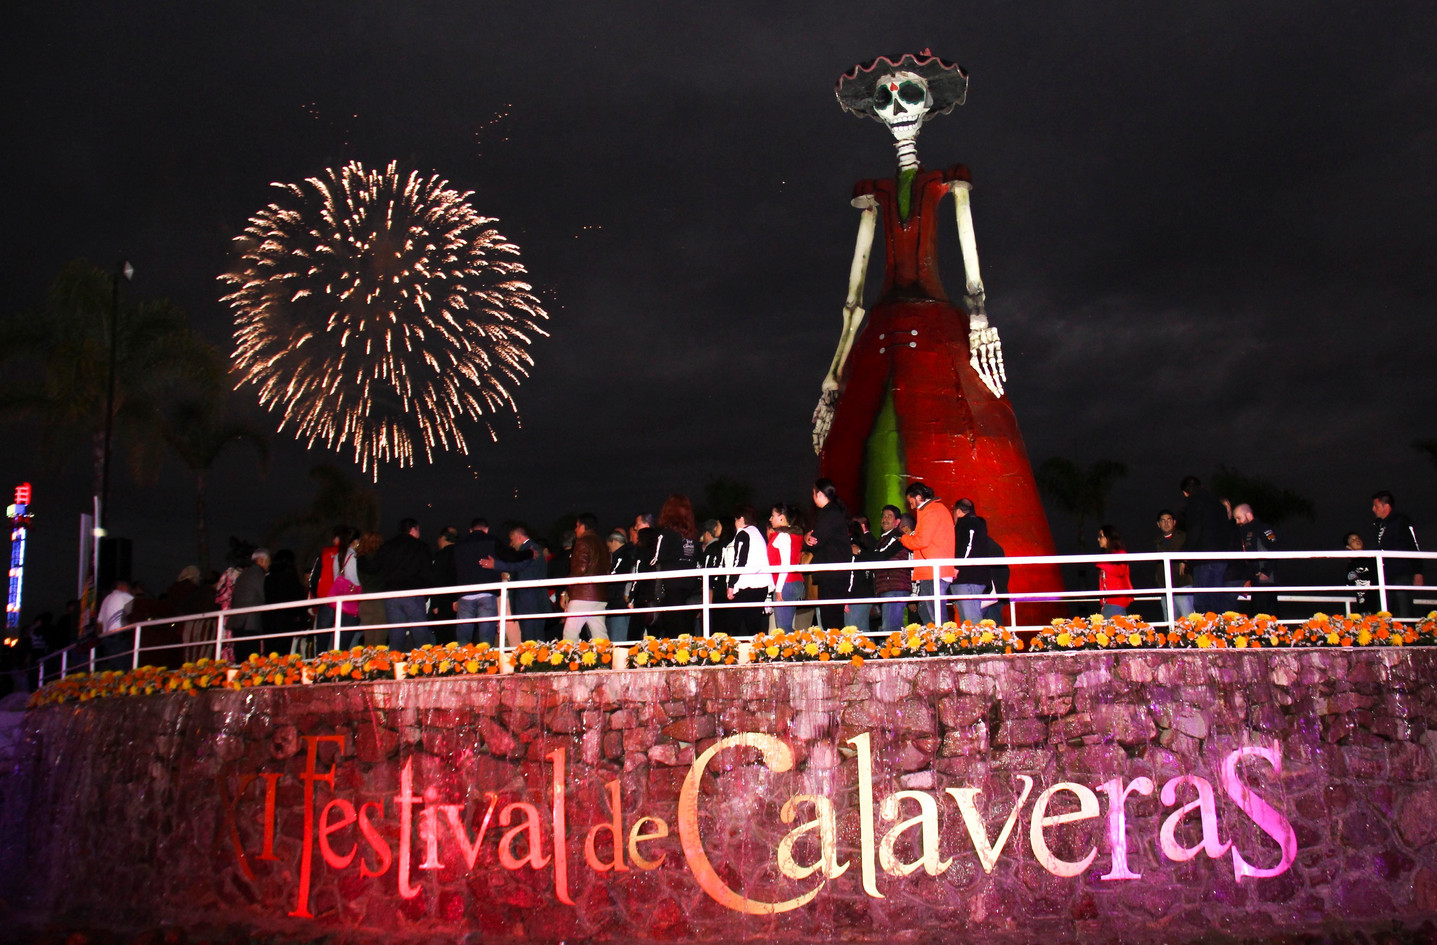 calaveras-01.jpg